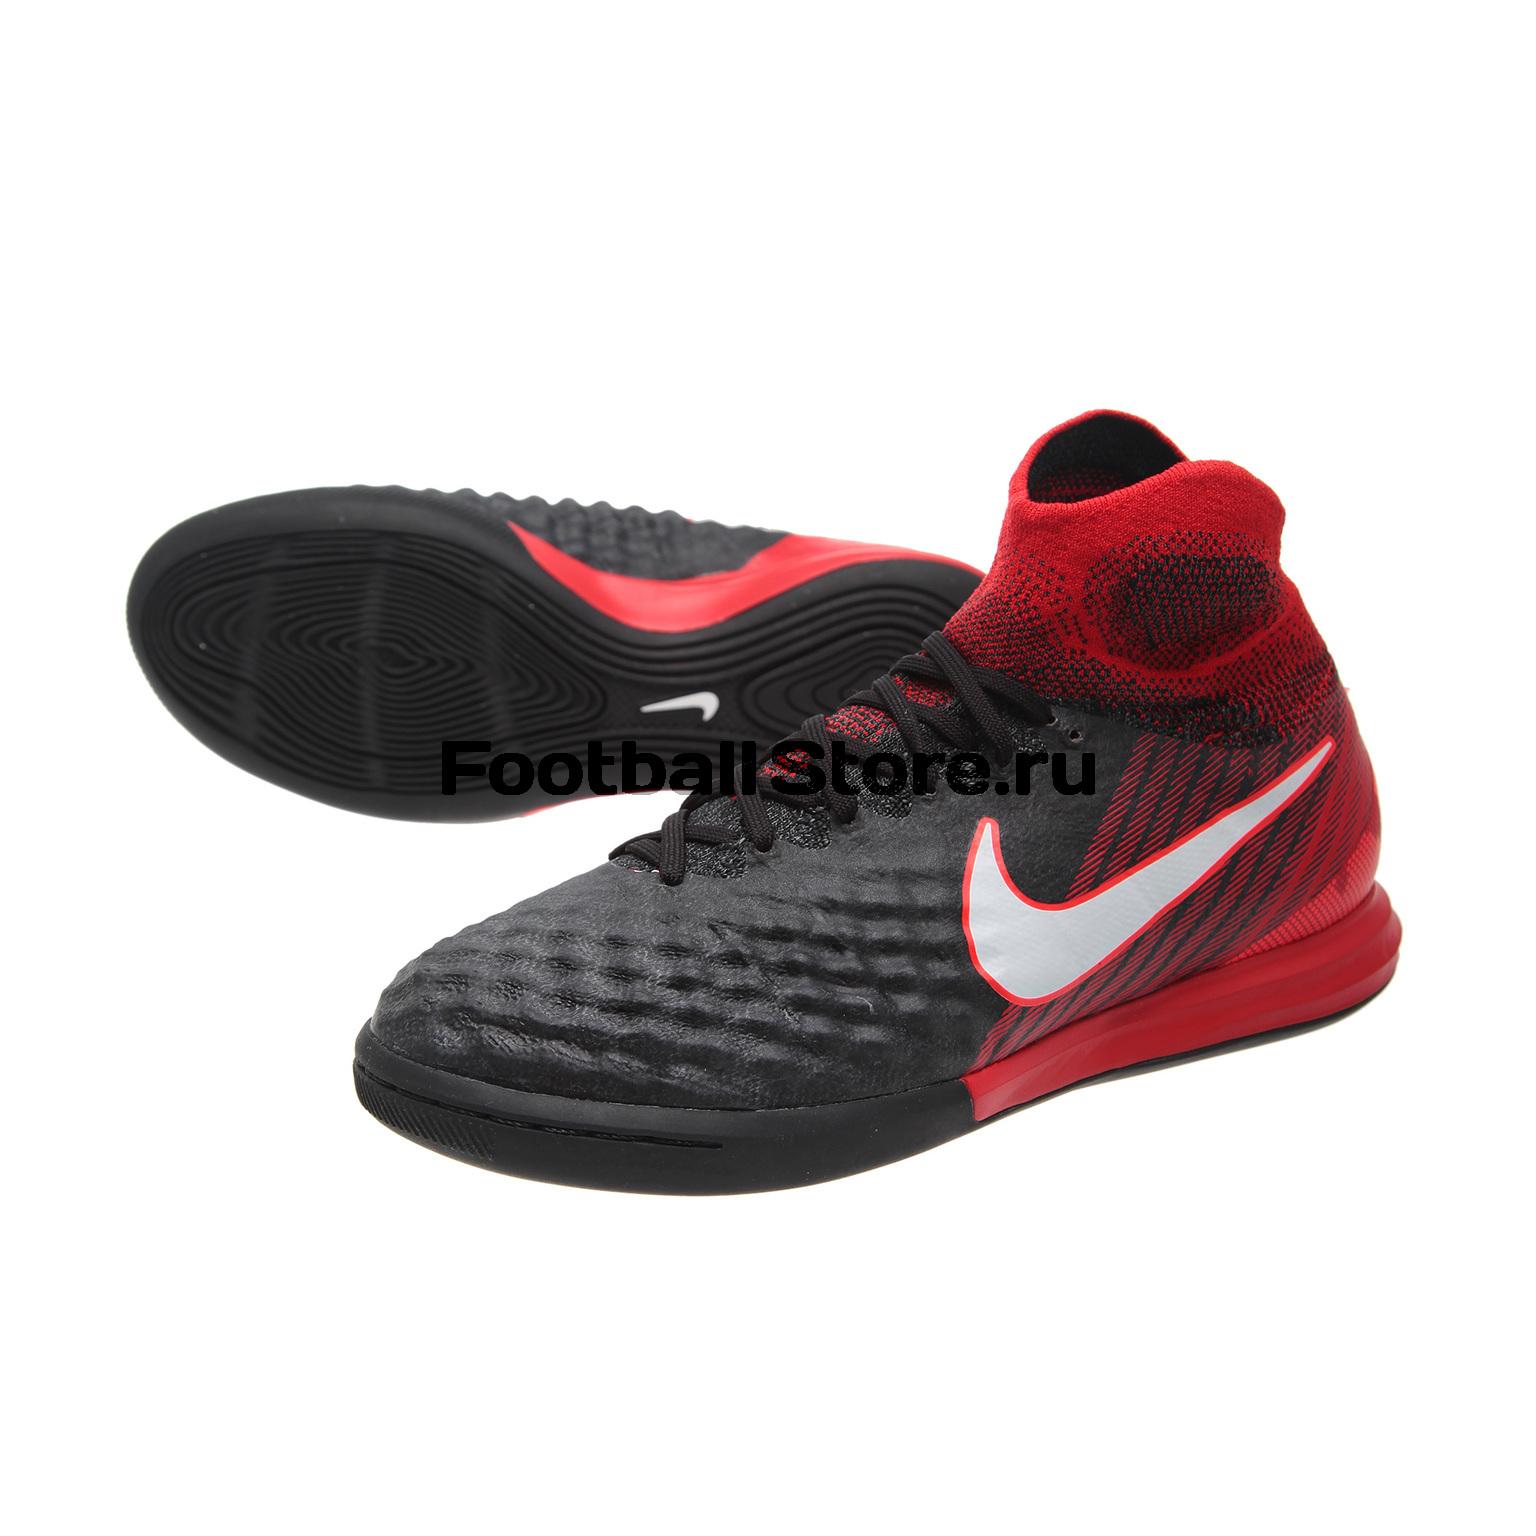 Обувь для зала Nike JR Magista Proximo II IC 843955-061 обувь для зала nike обувь для зала nike mercurialx proximo ii df ic 831976 801